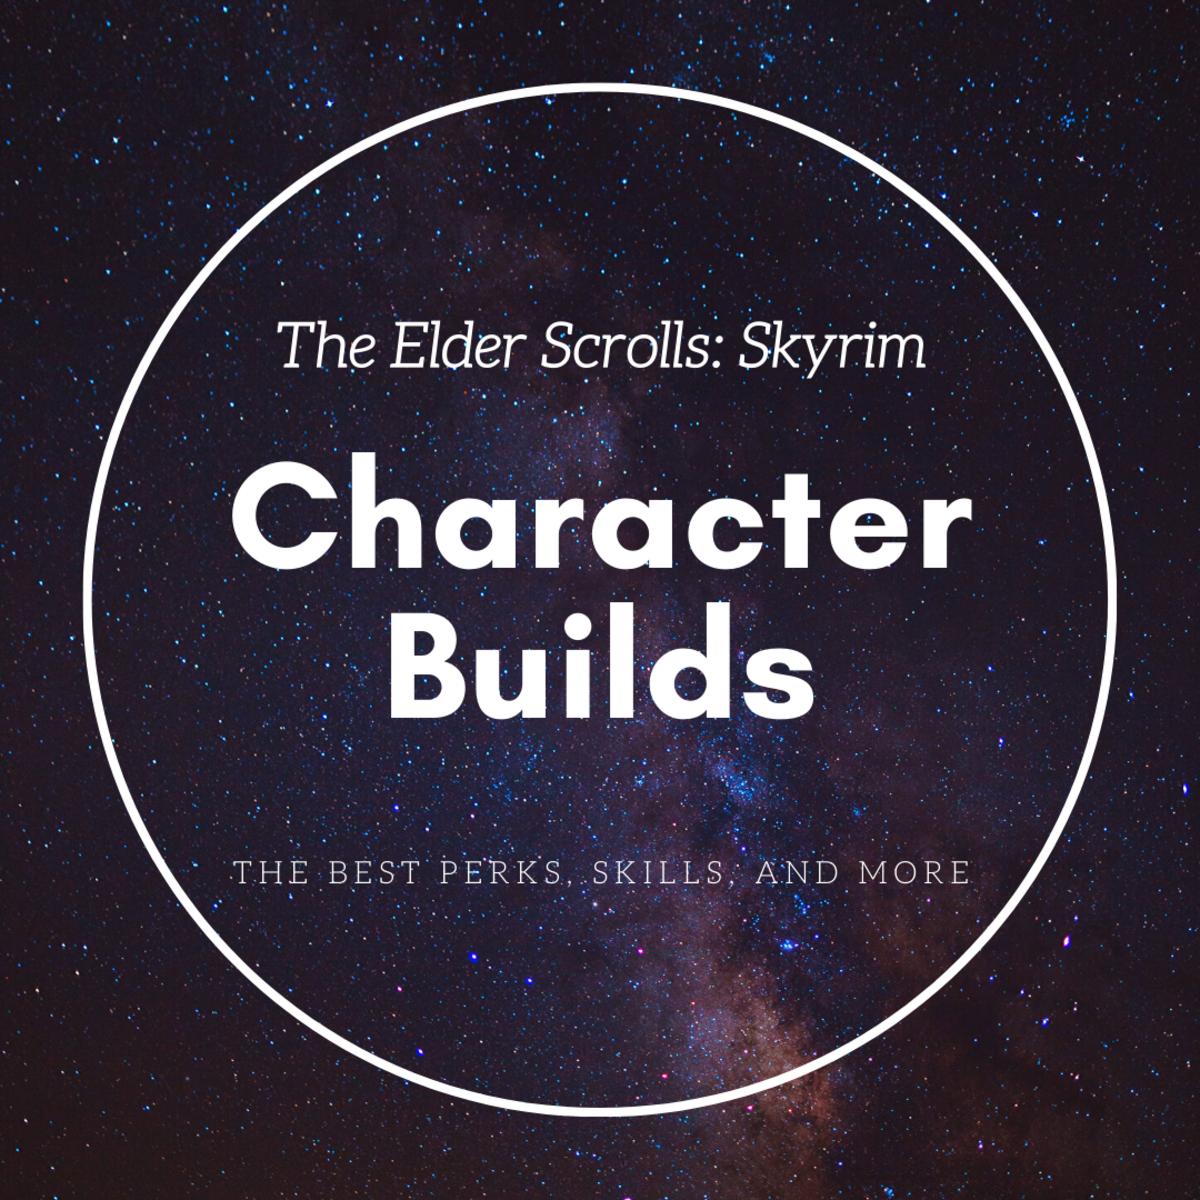 """The Elder Scrolls: Skyrim"": Three Simple Character Builds"